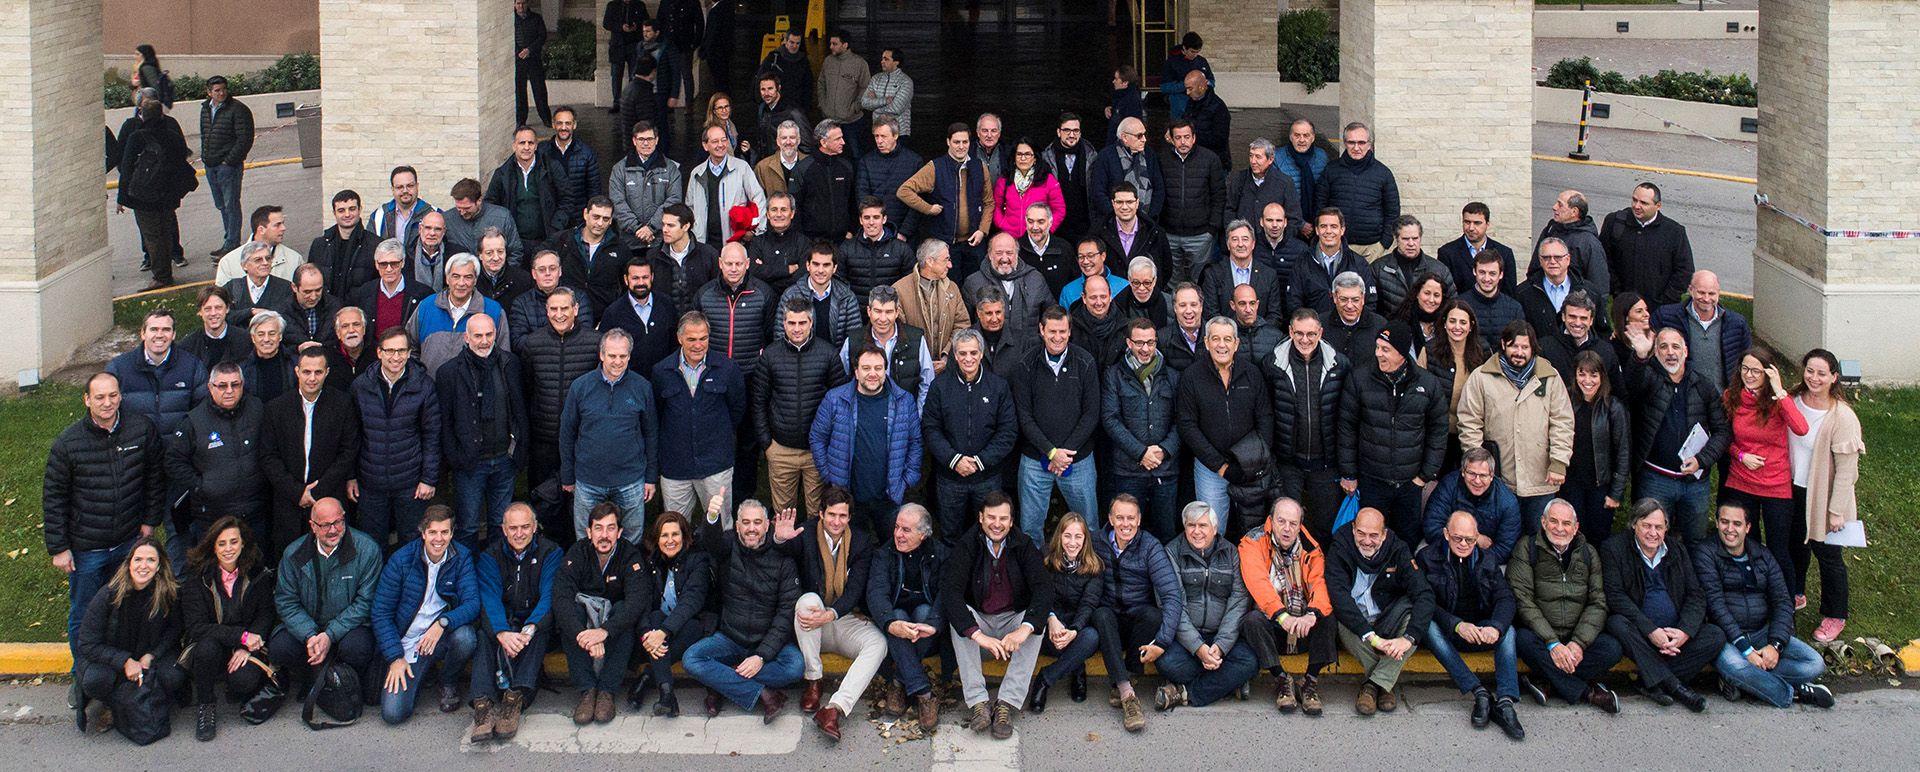 Los empresarios del Precoloquio de Neuquén, ayer en Bodegas Schroeder